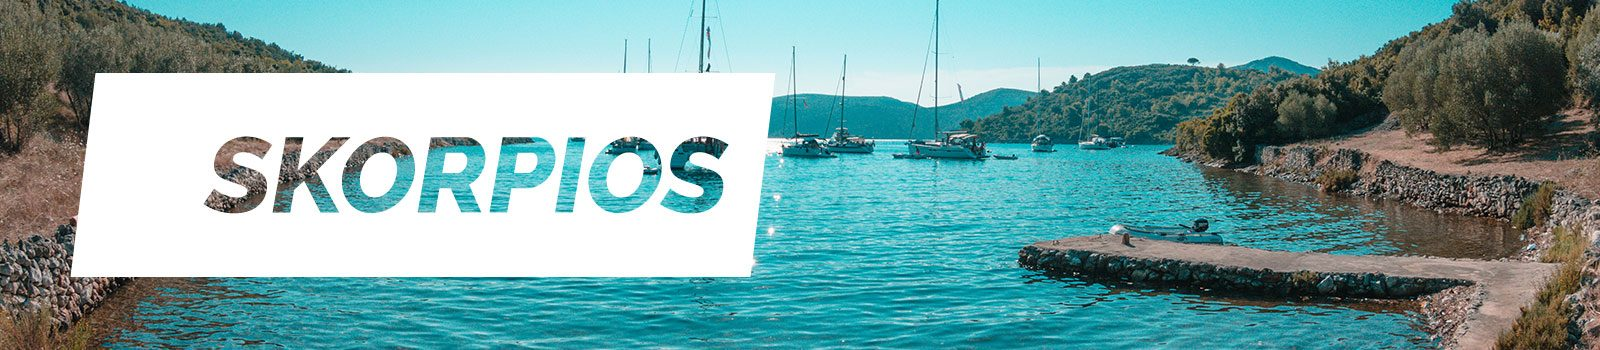 b11-barca-vela-skorpios